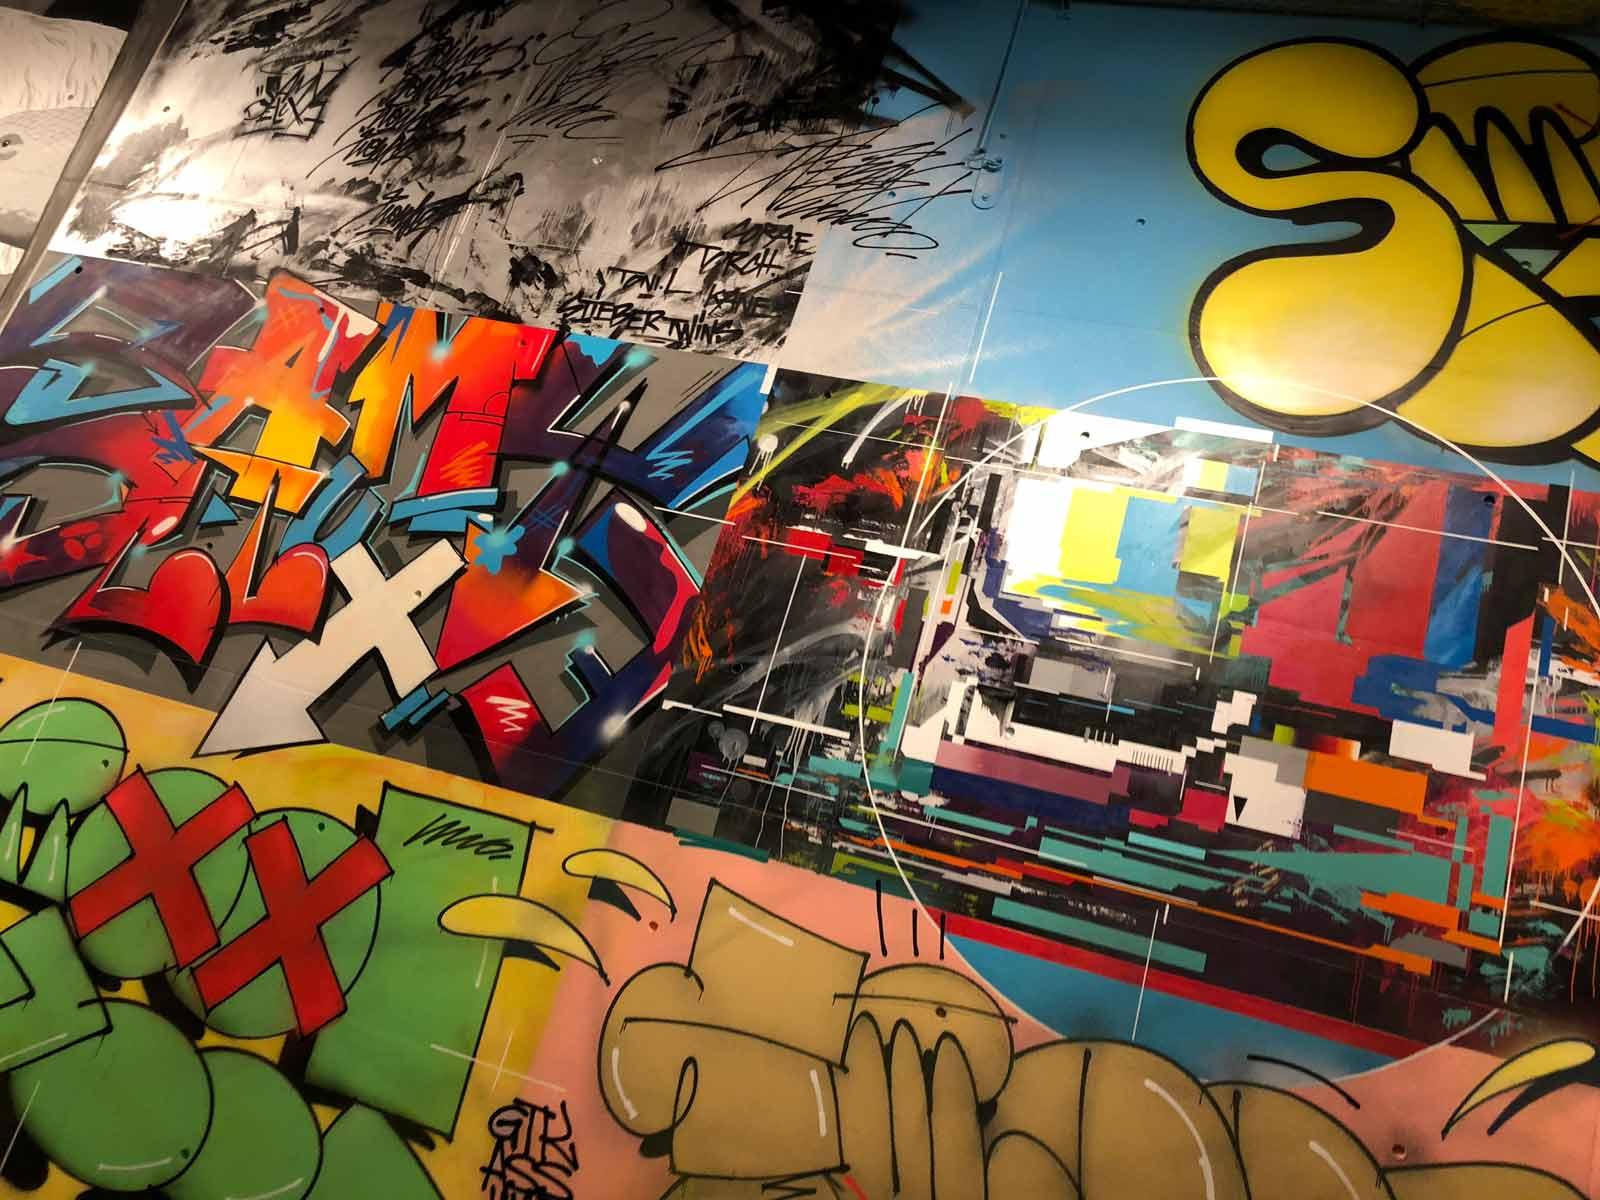 Buntes collageartiges Mural